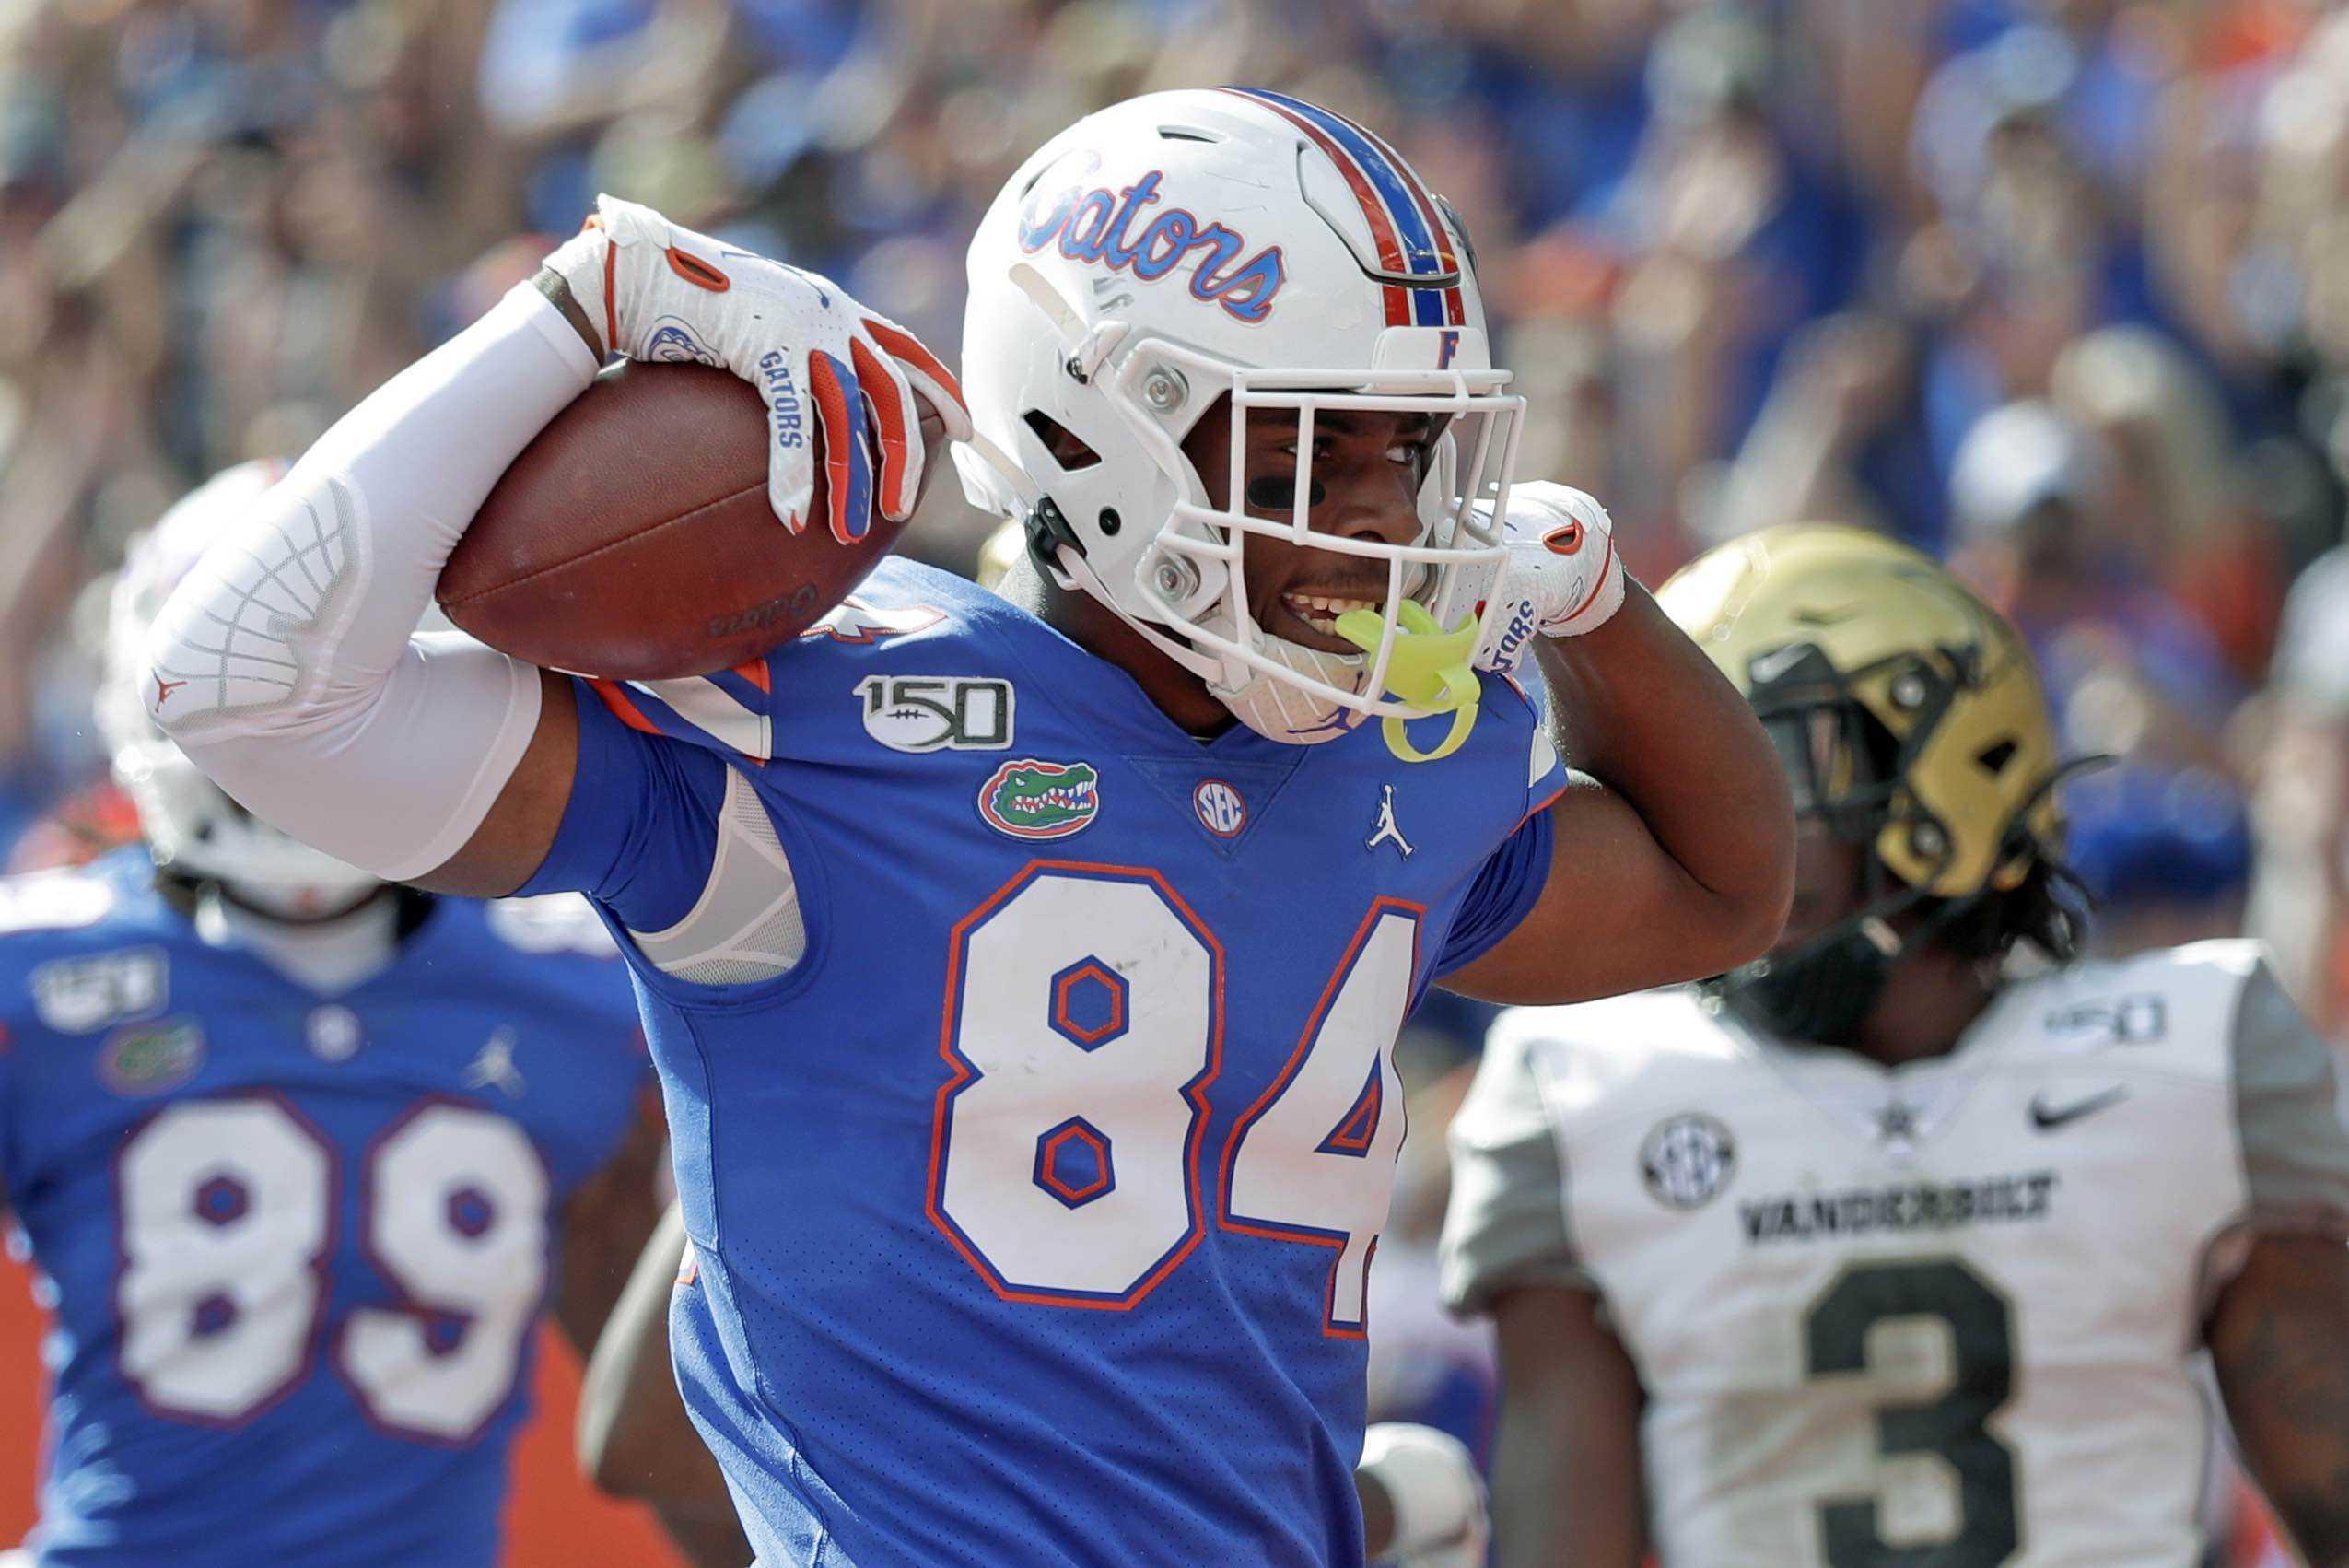 2021 NFL Draft Player Breakdown: Kyle Pitts